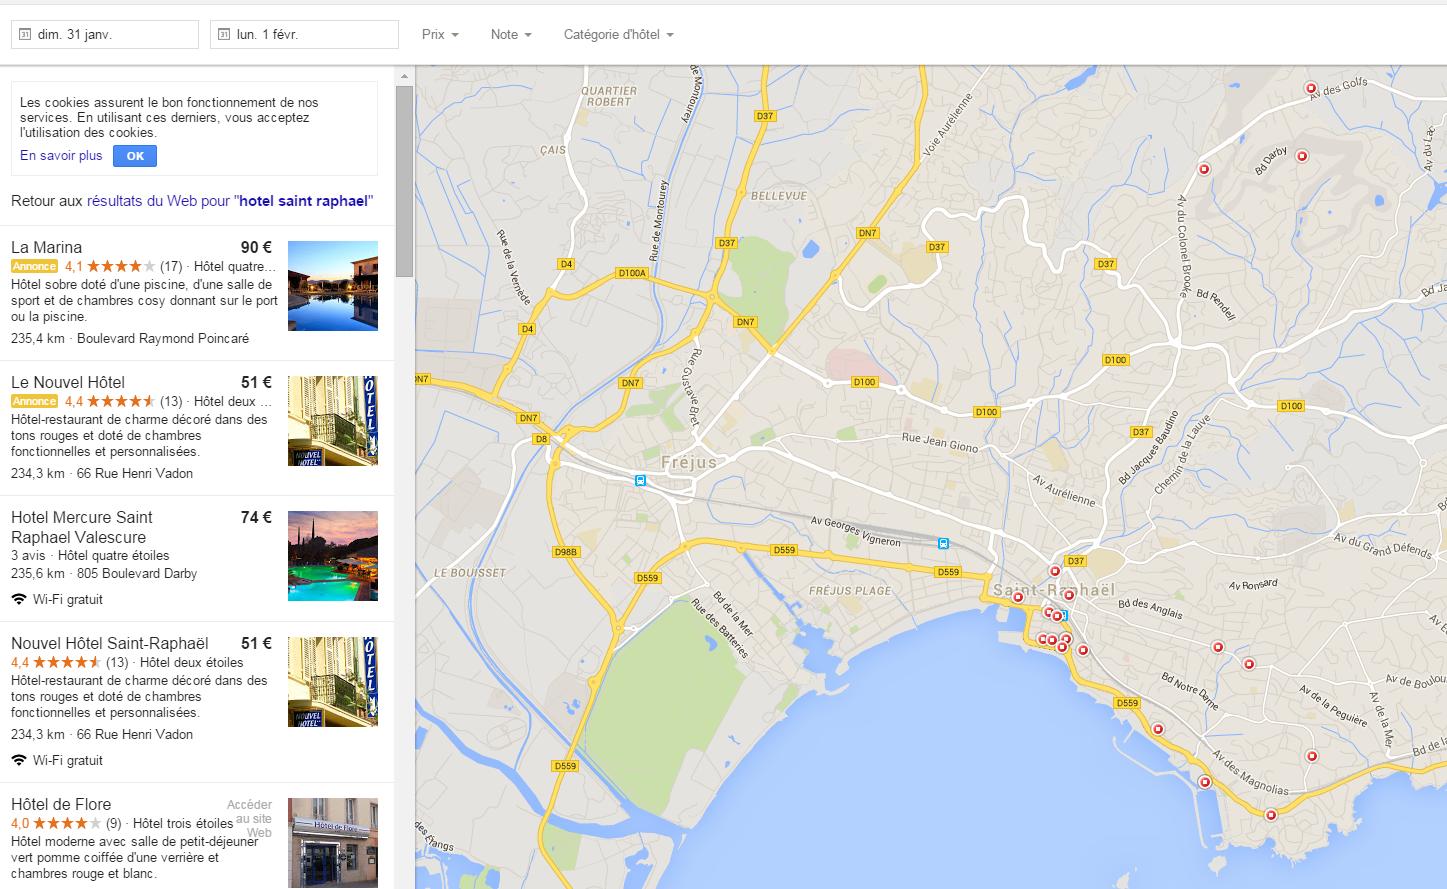 hotel saint raphael - Recherche Google - Google Chrome_2016-01-20_20-33-57